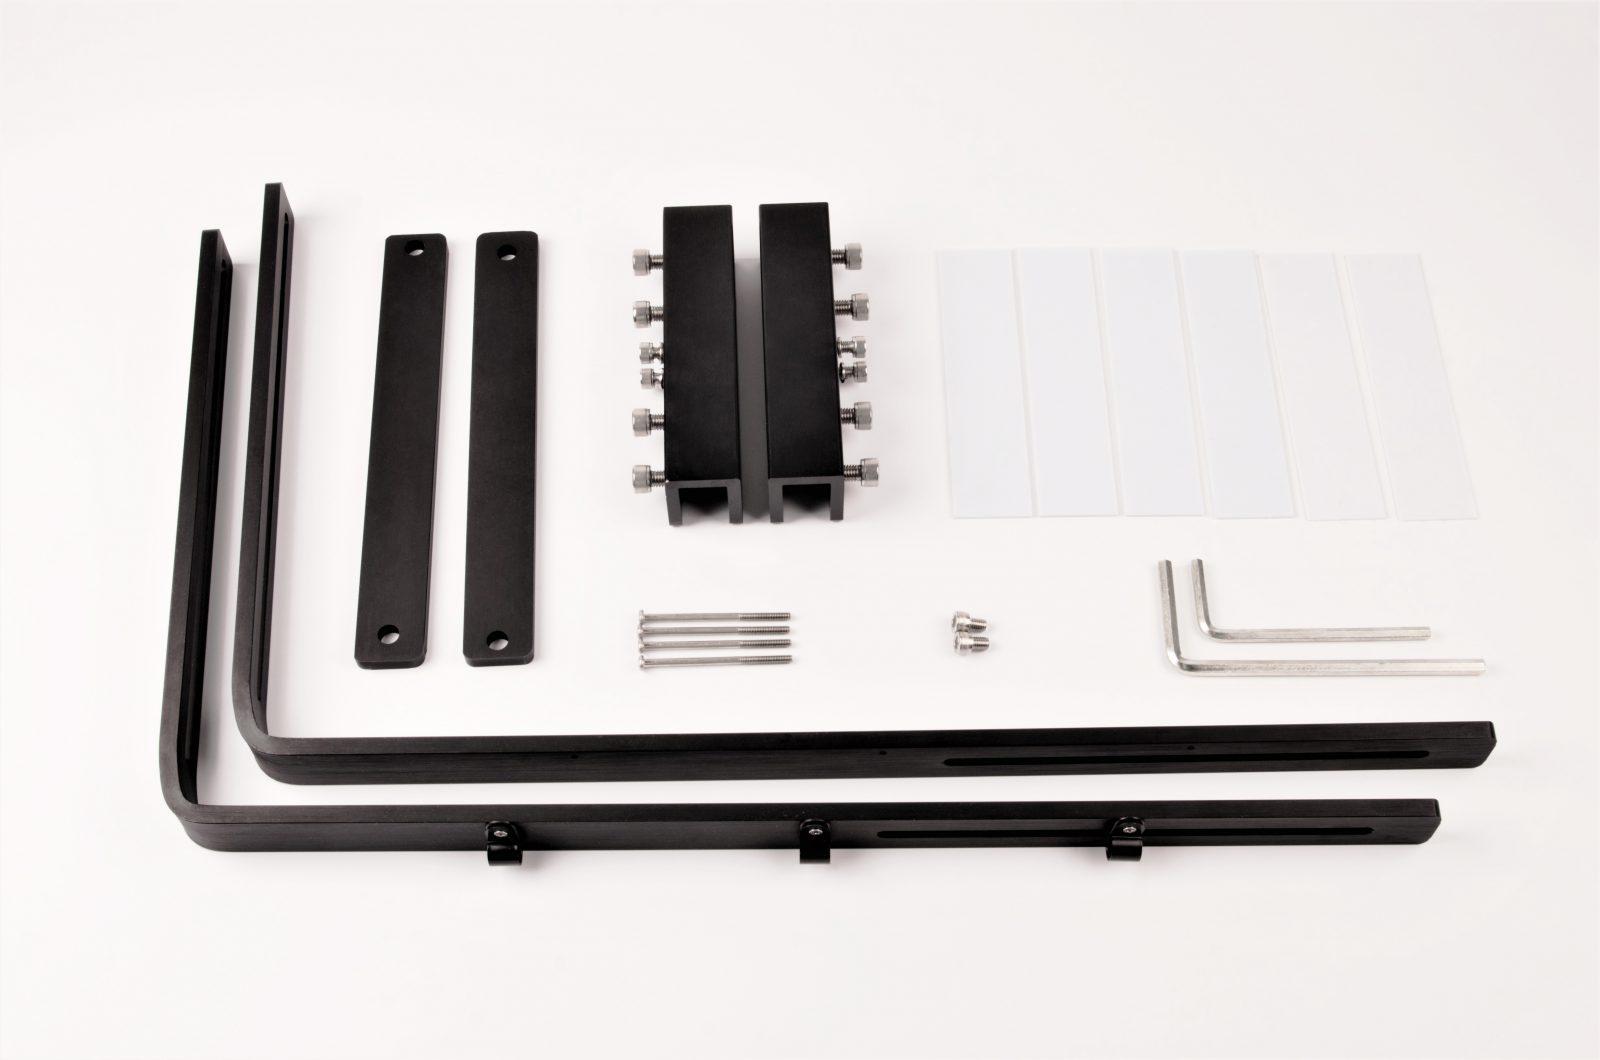 Sistema di aggancio a bordo vasca Orphek arm mounting kit